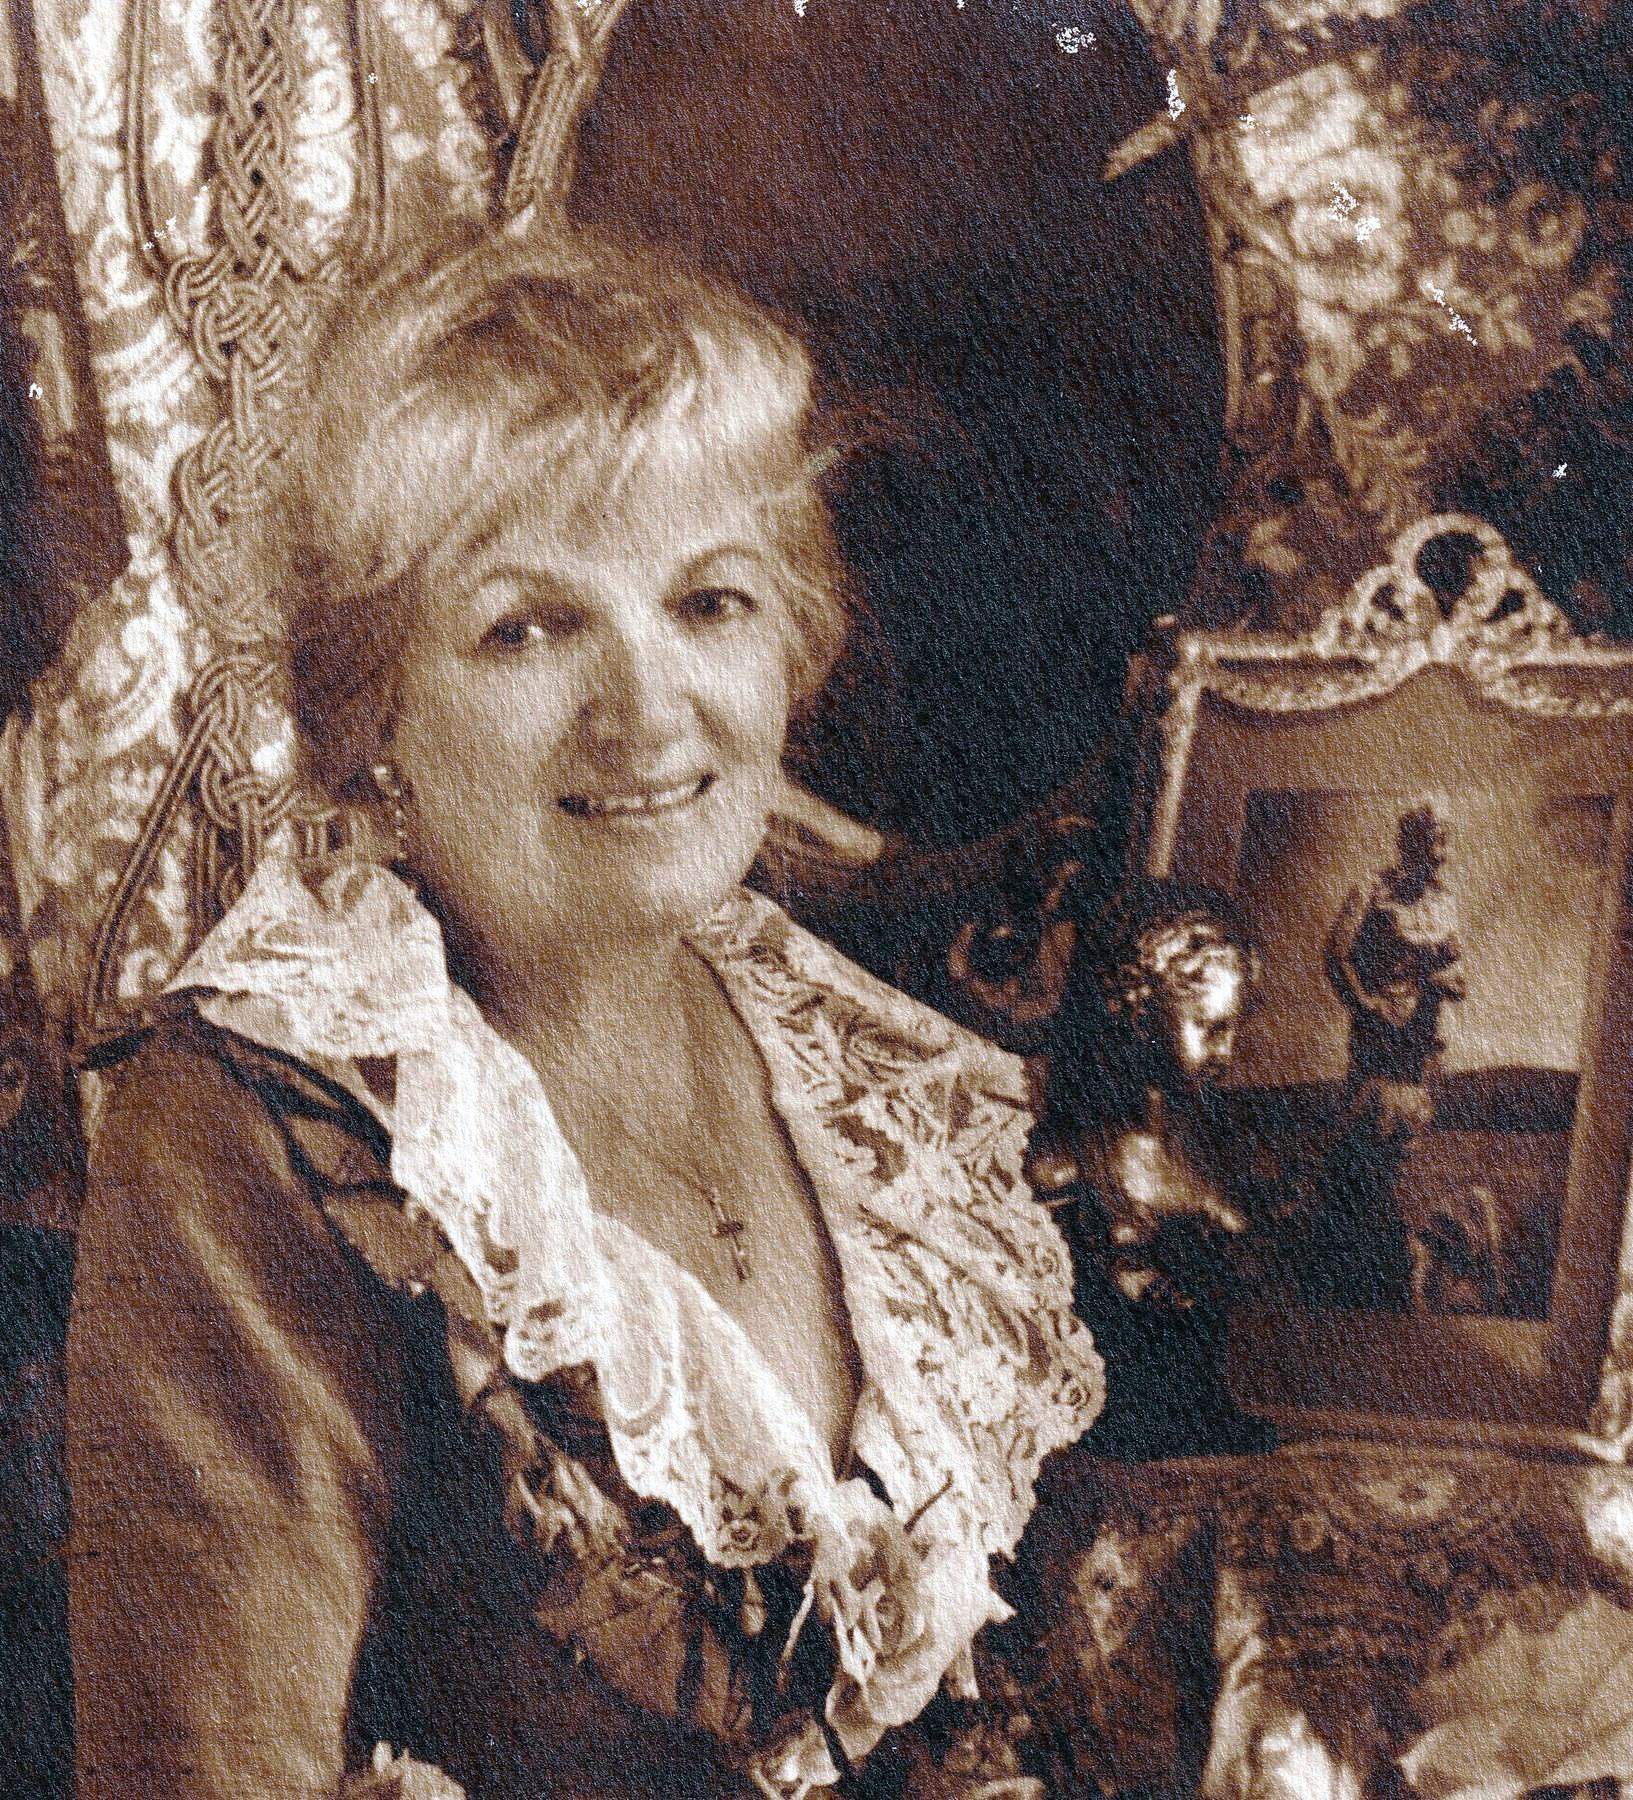 Gertrude  Gardner